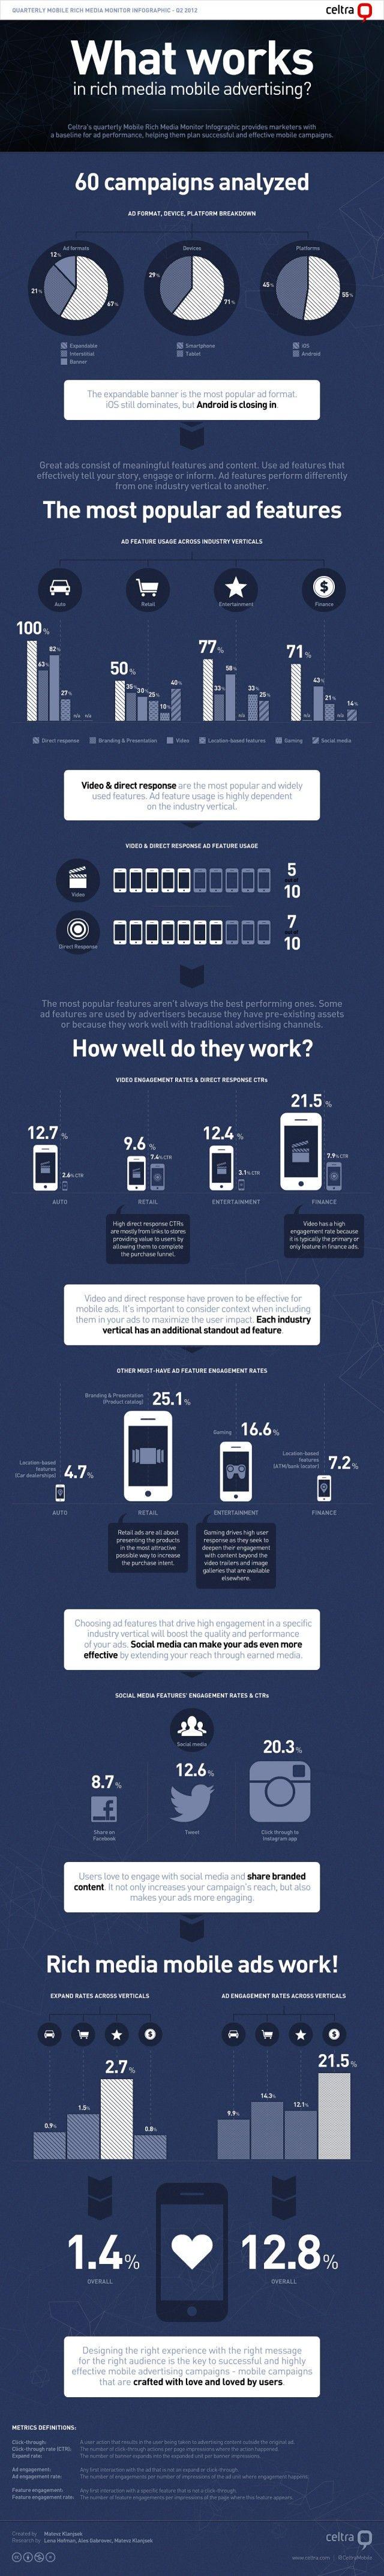 ¿Qué funciona en Marketing Móvil?#Infografia What Works in Mobile Rich Media Advertising?